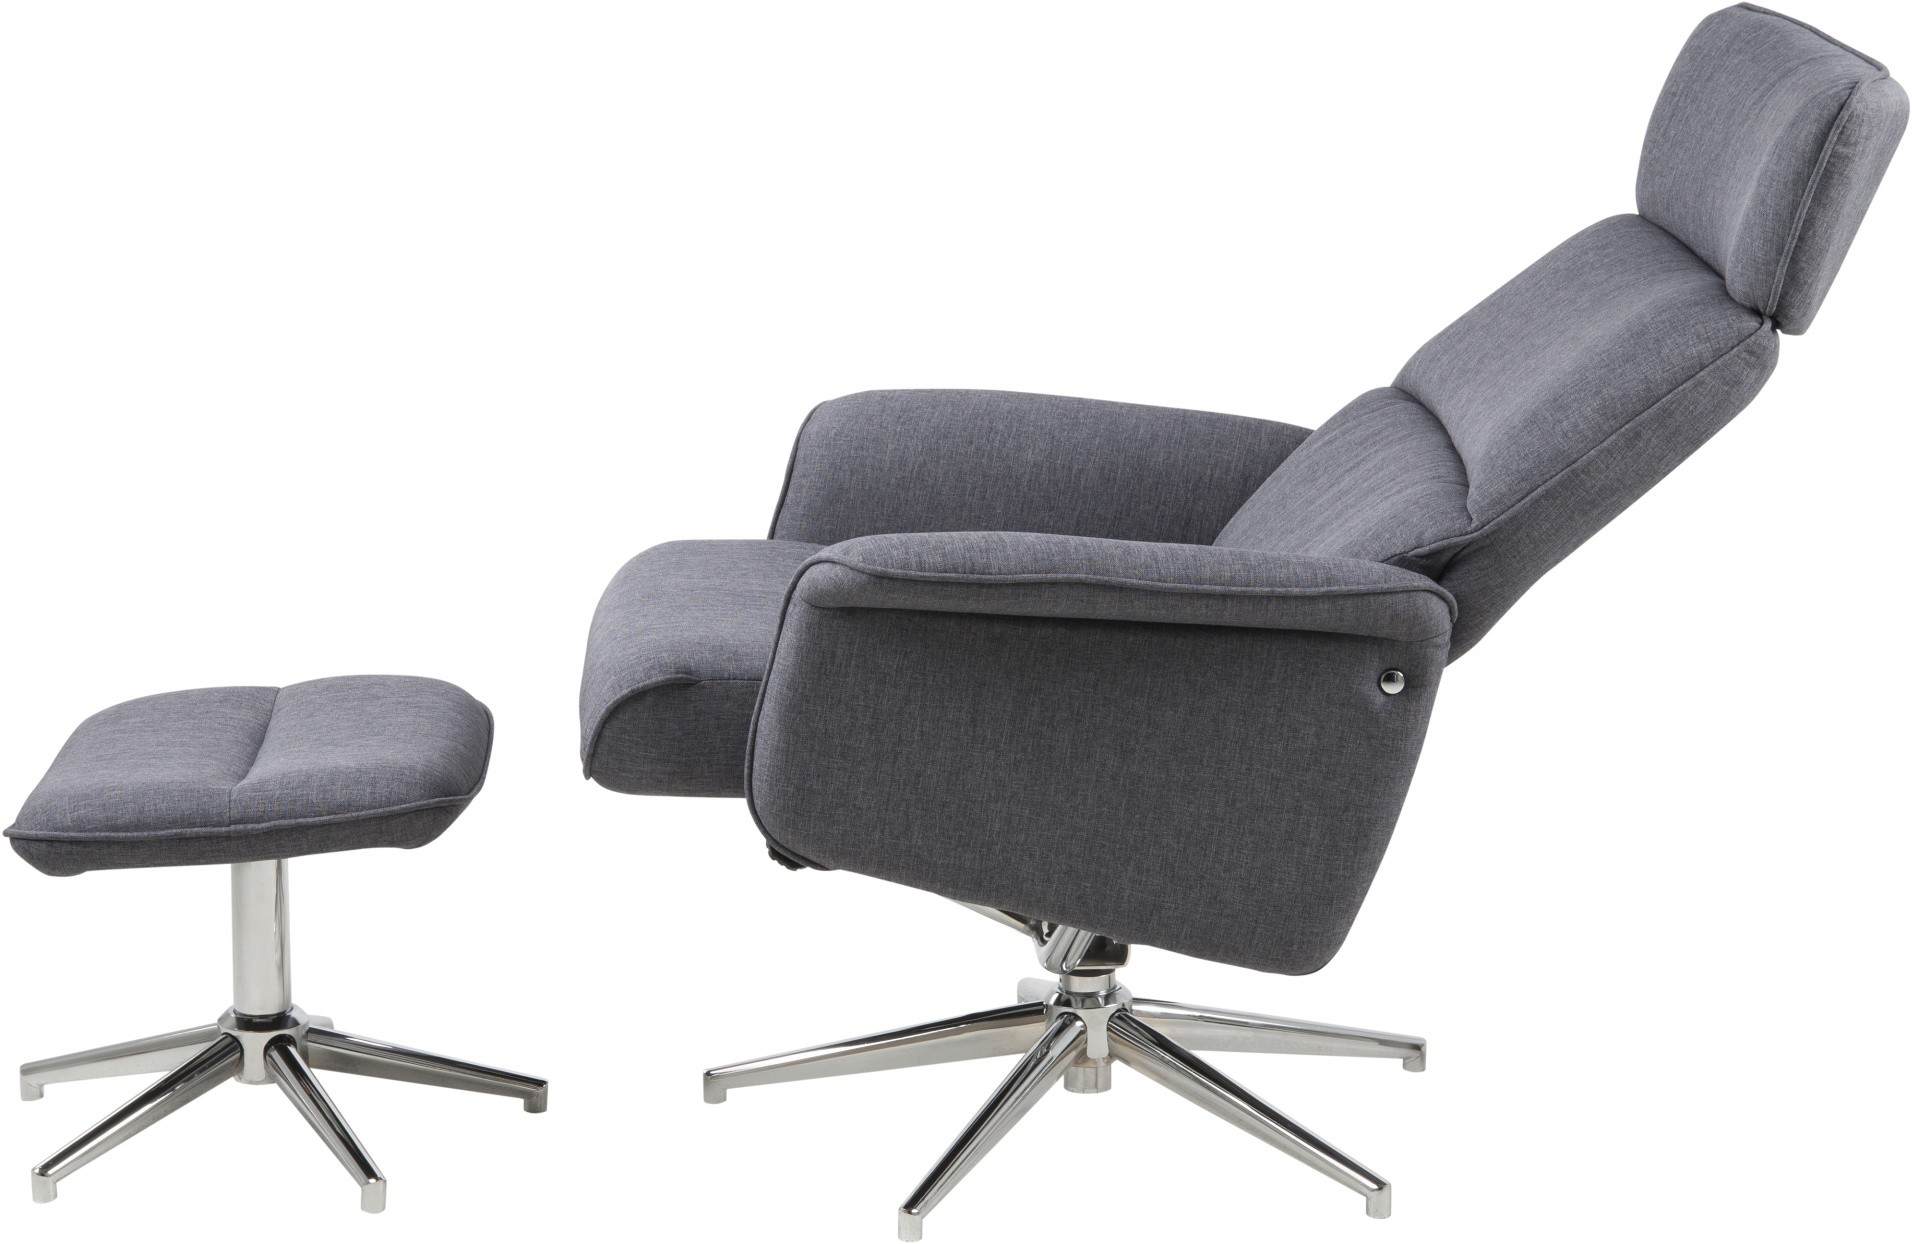 24Designs Relax Fauteuil Avery + Hocker - B74 X D111 X H110 Cm - Stof - Donkergrijs